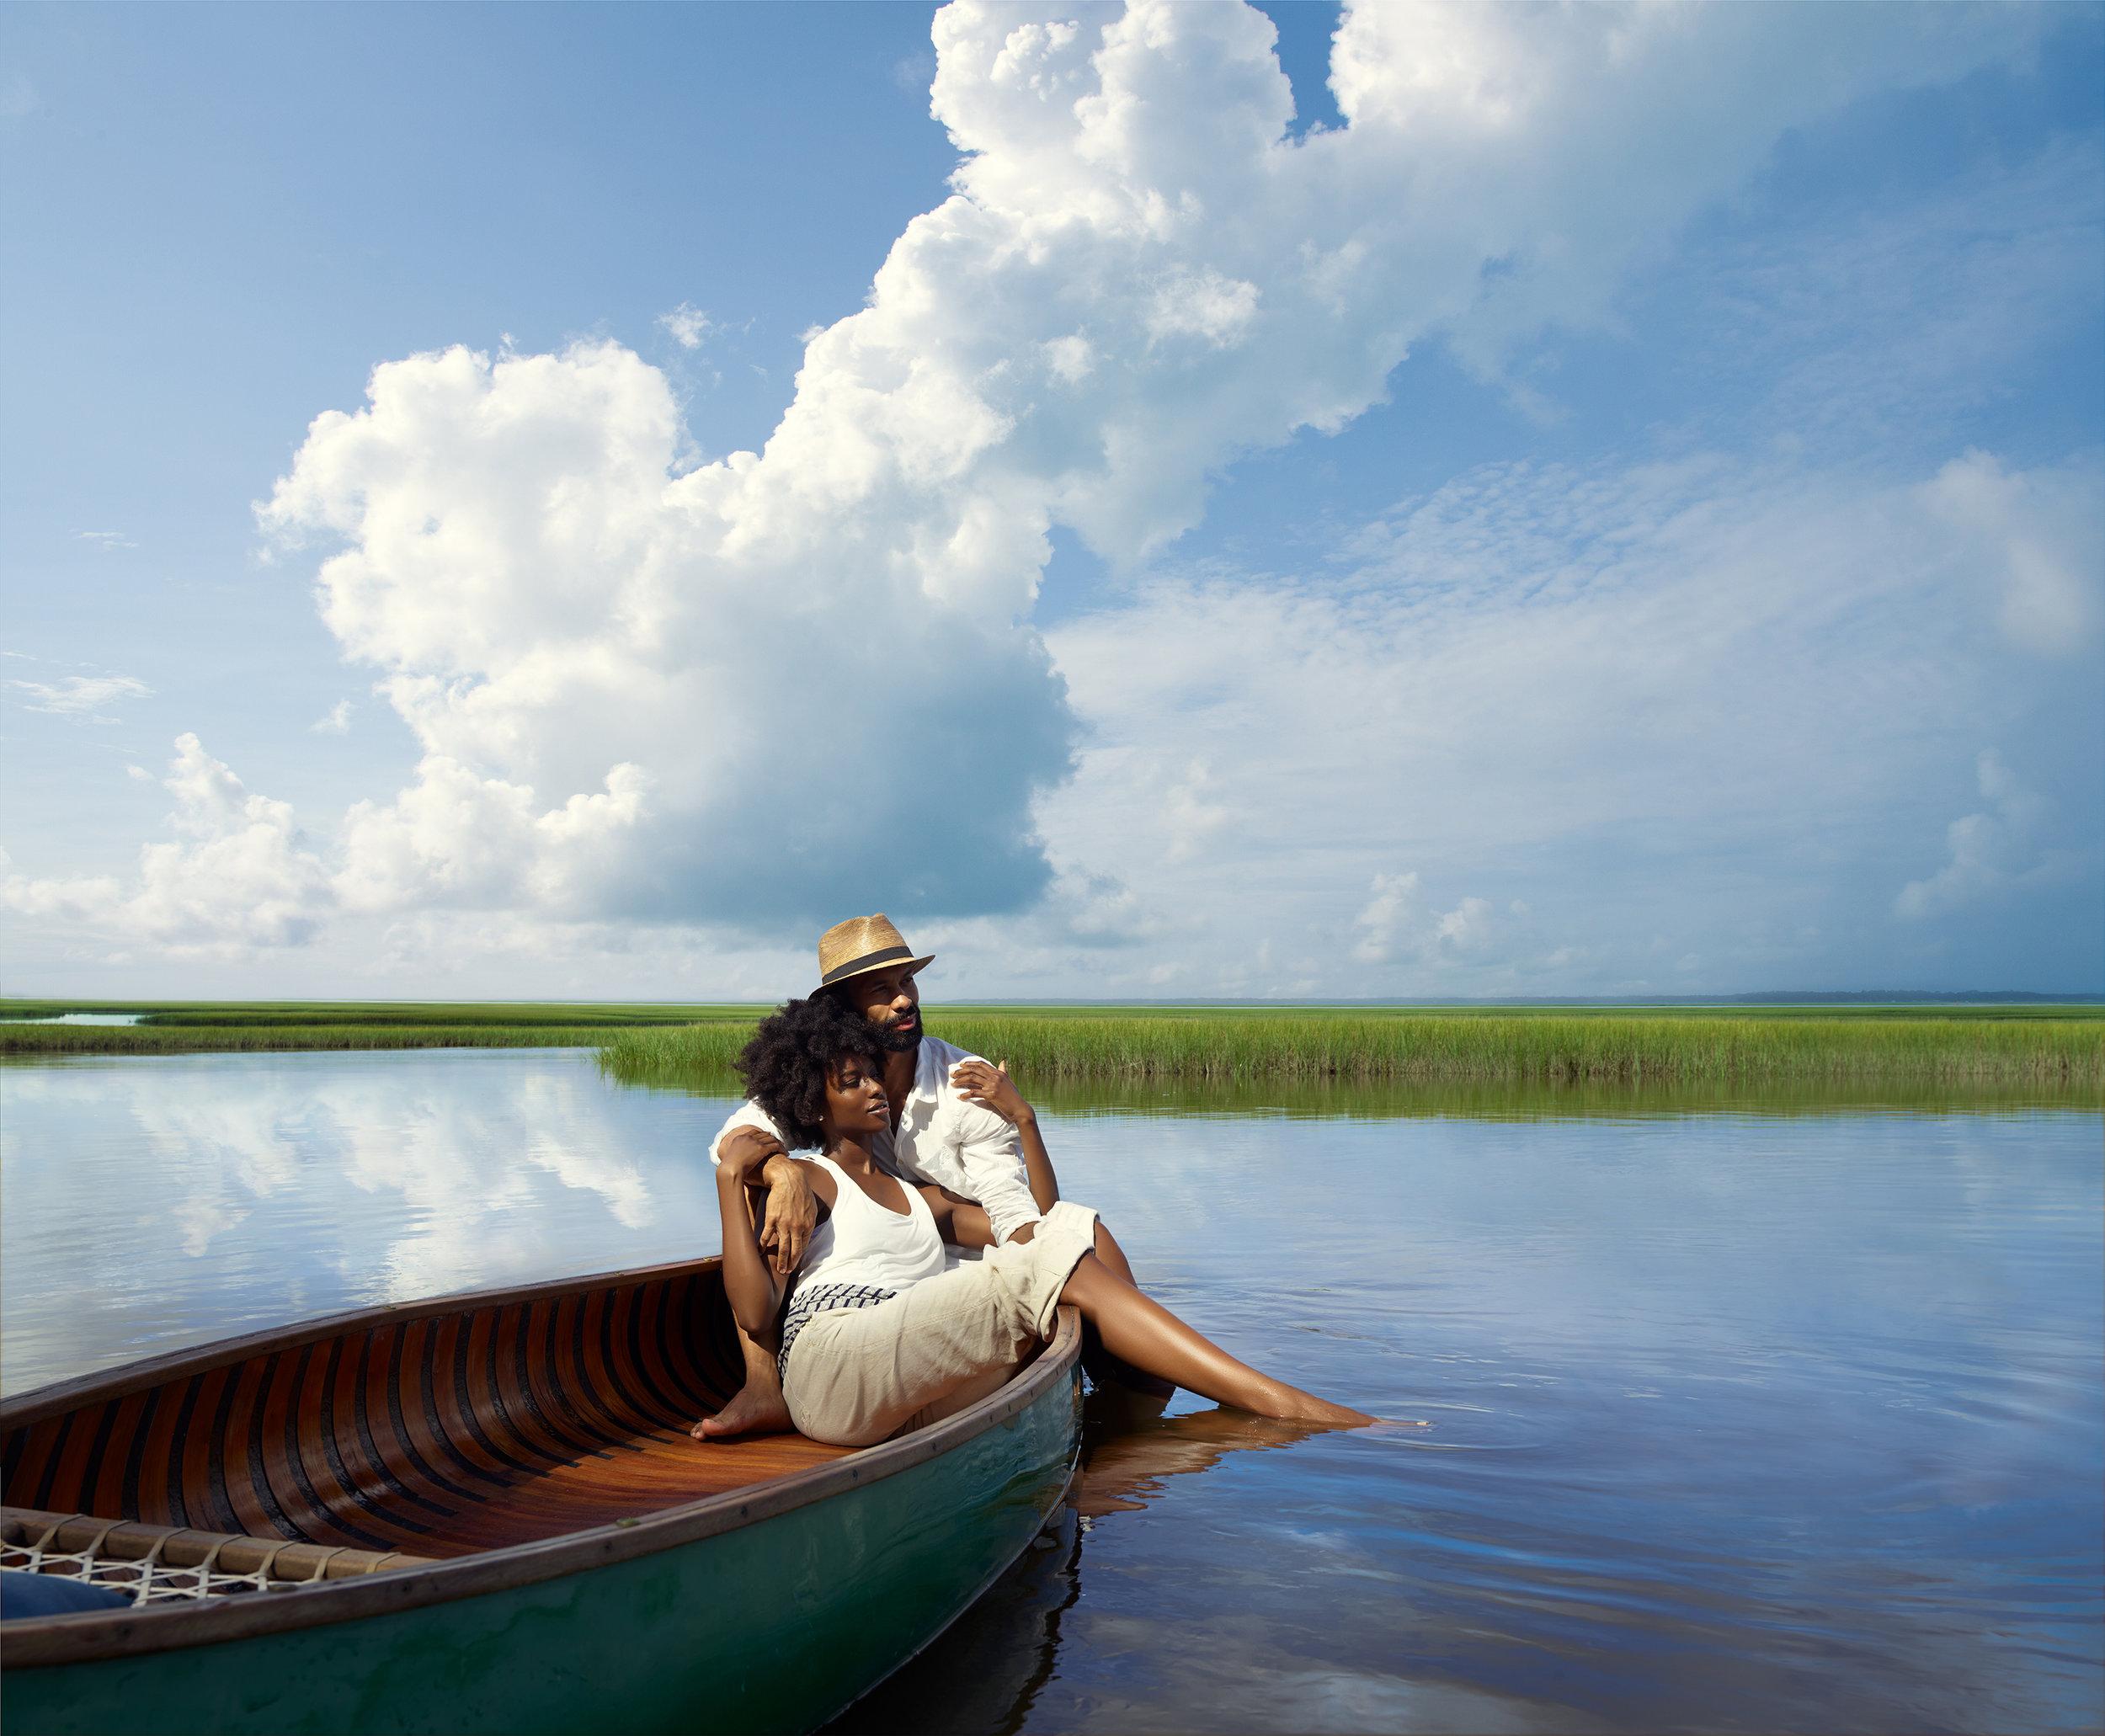 AMI-ESS-Picturesque-Canoe-sm.jpg